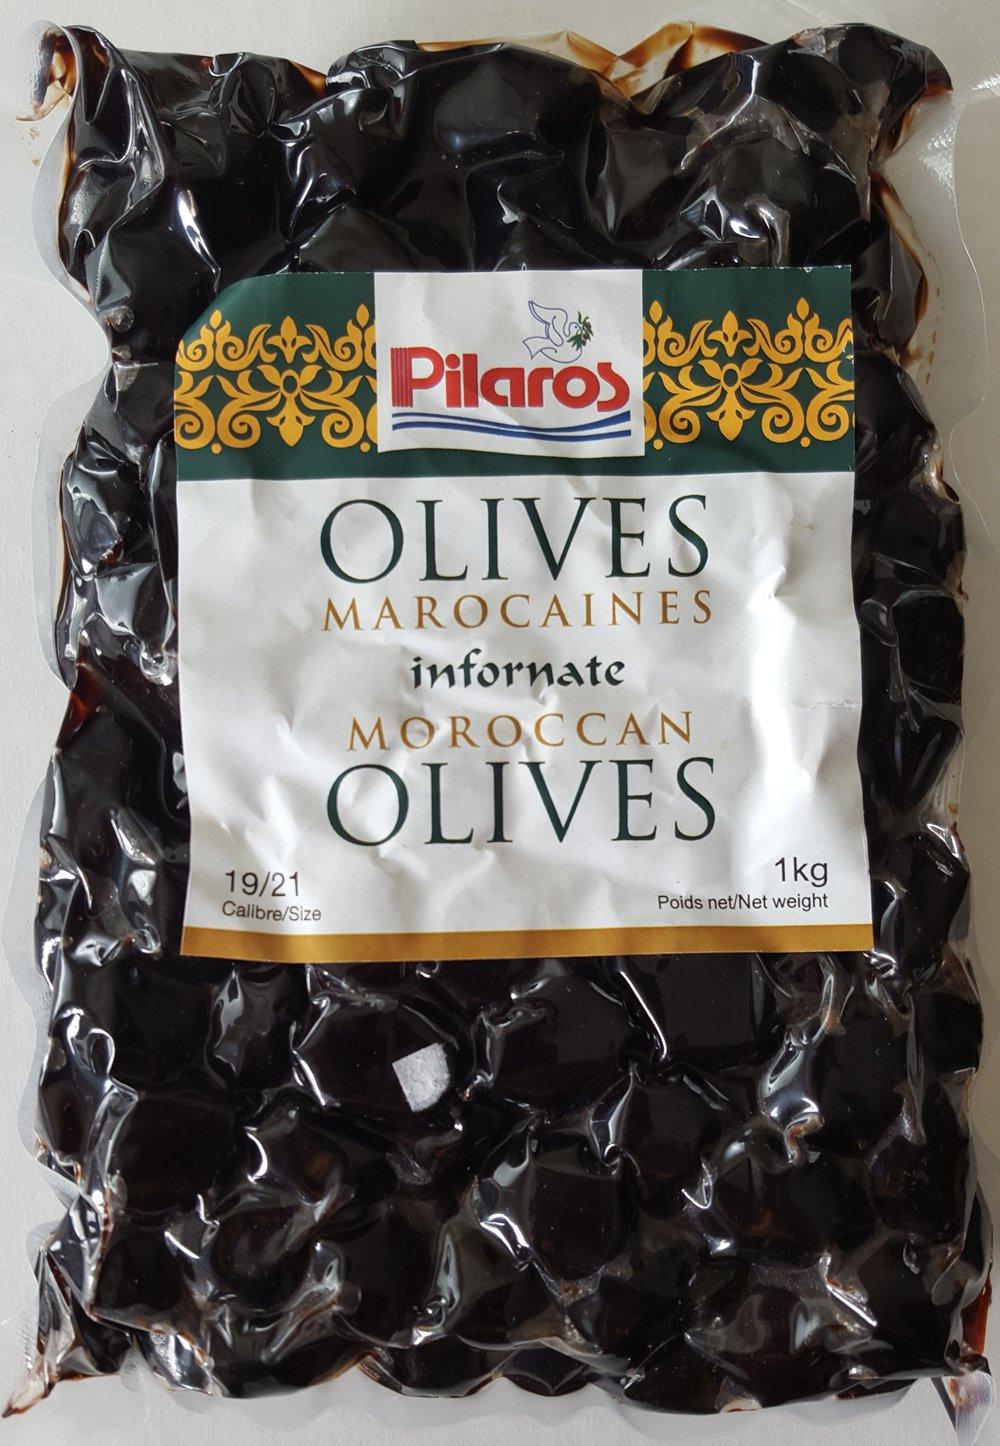 Pilaros online Oakland Mall shopping Morrocan 1Kg Olives